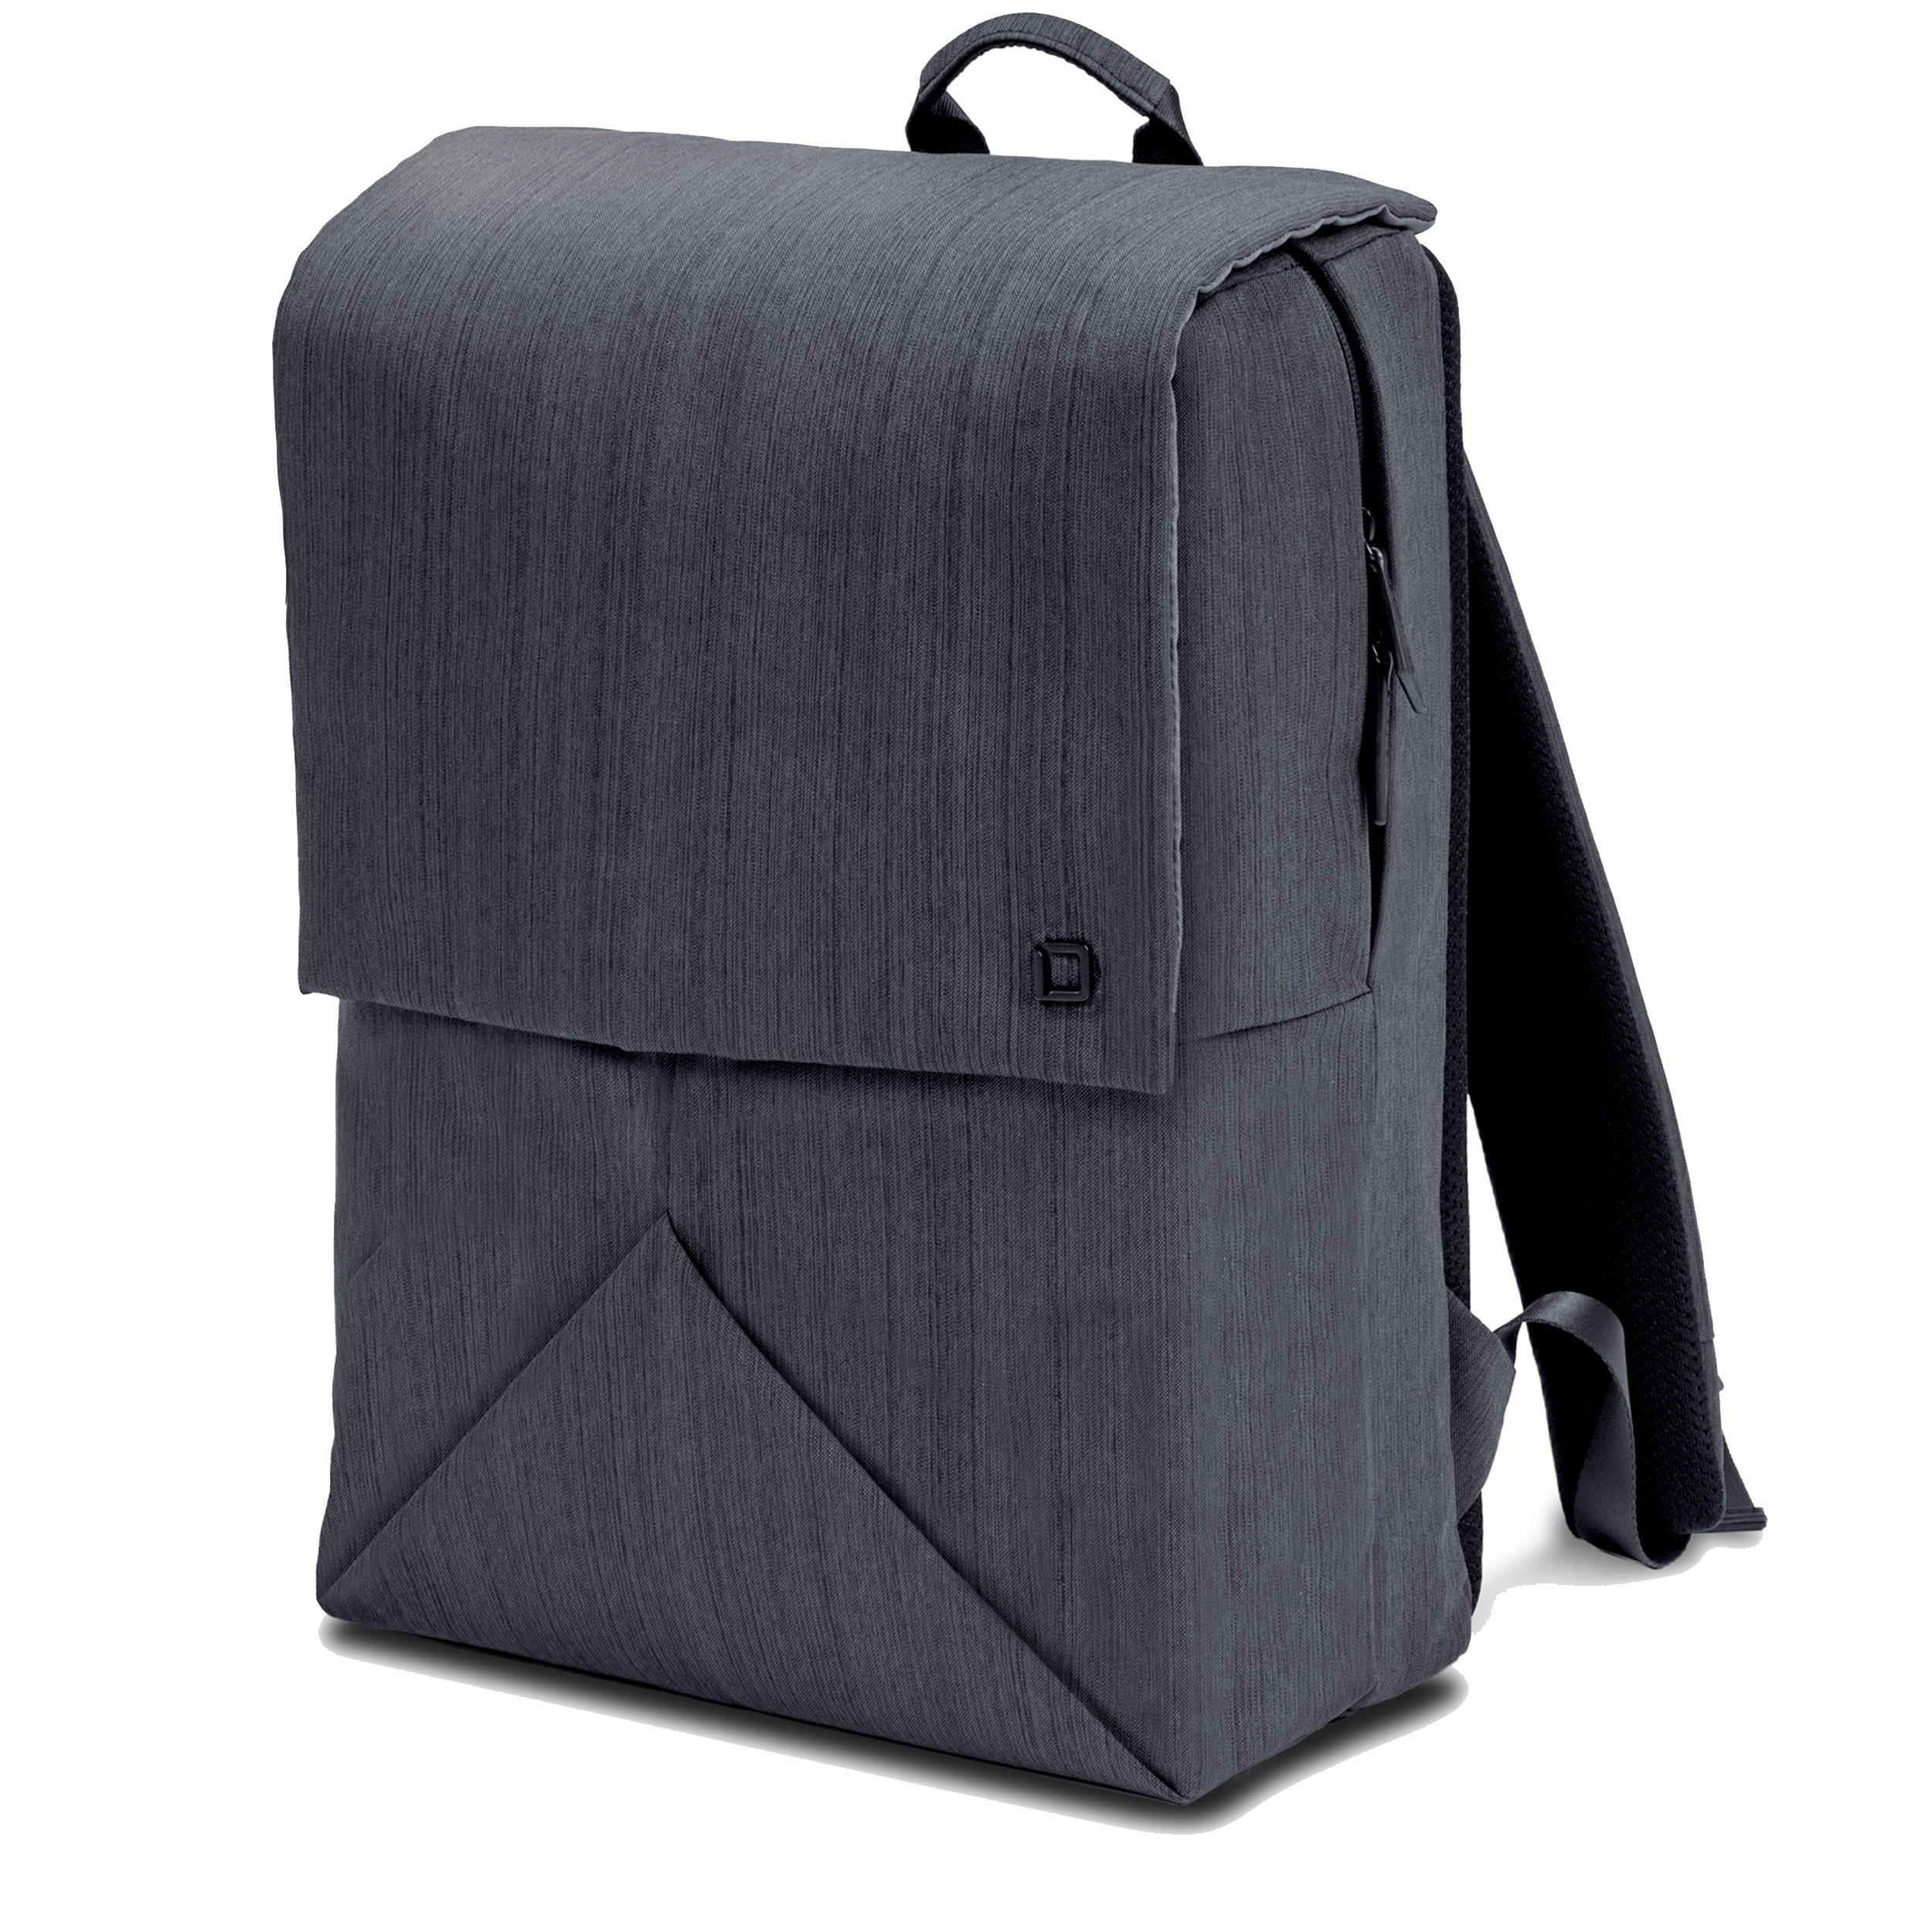 Dicota Code Backpack 13-15 15 Backpack Black - notebook cases (38.1 cm (15), Backpack, Black, P